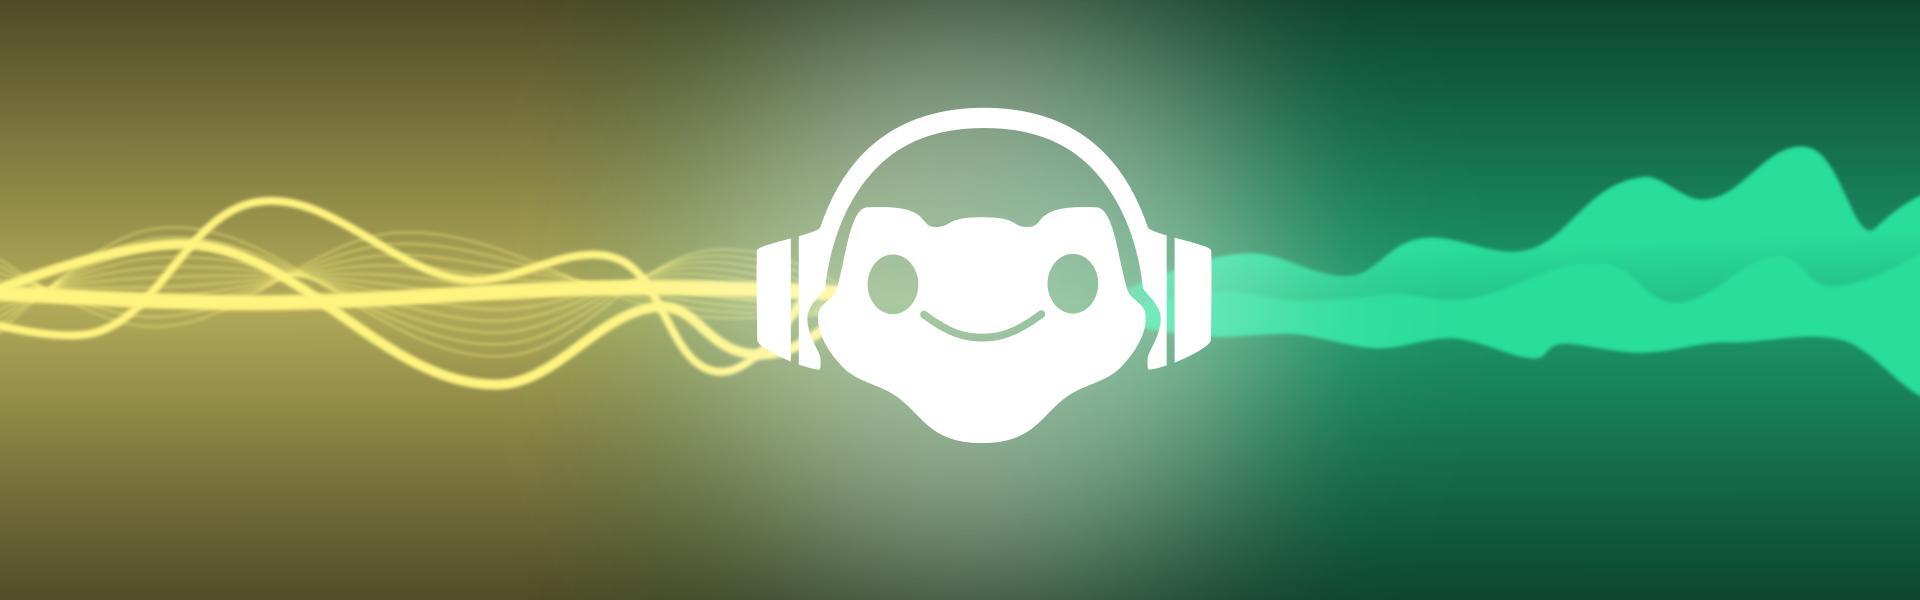 Musica senza Copyright download